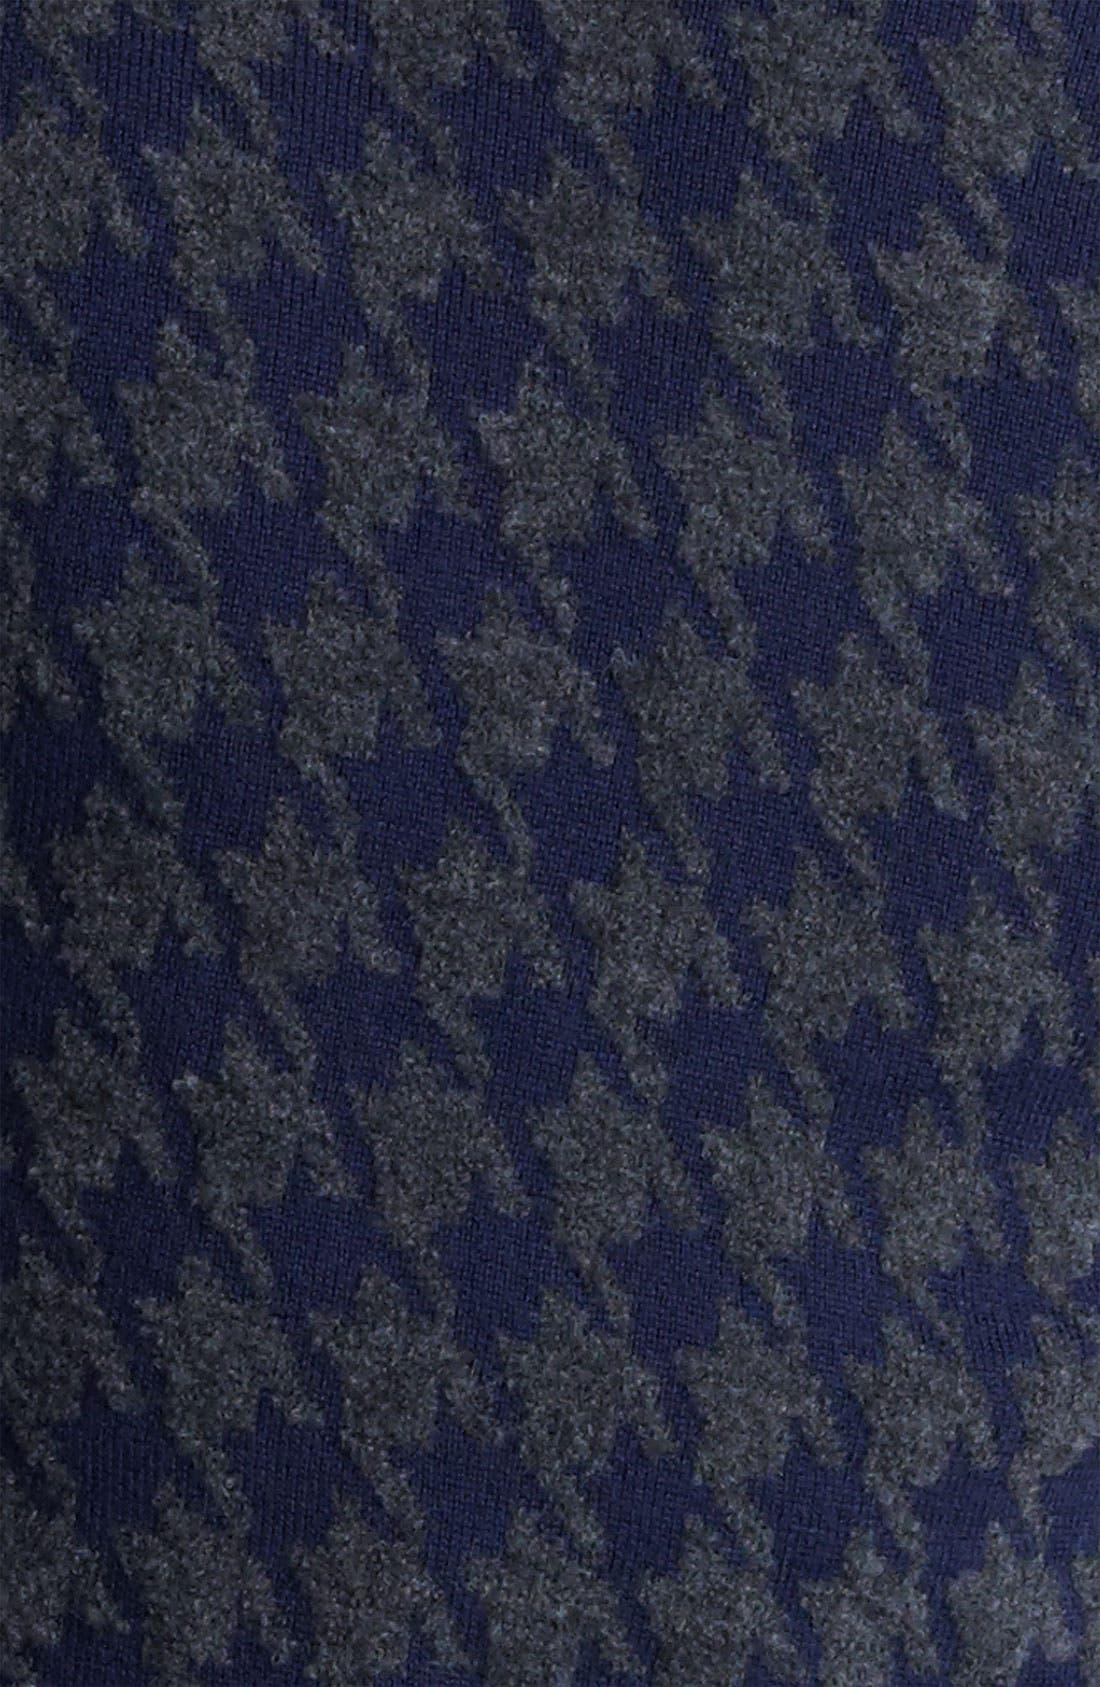 Z ZEGNA, Houndstooth Crewneck Sweater, Alternate thumbnail 3, color, 418